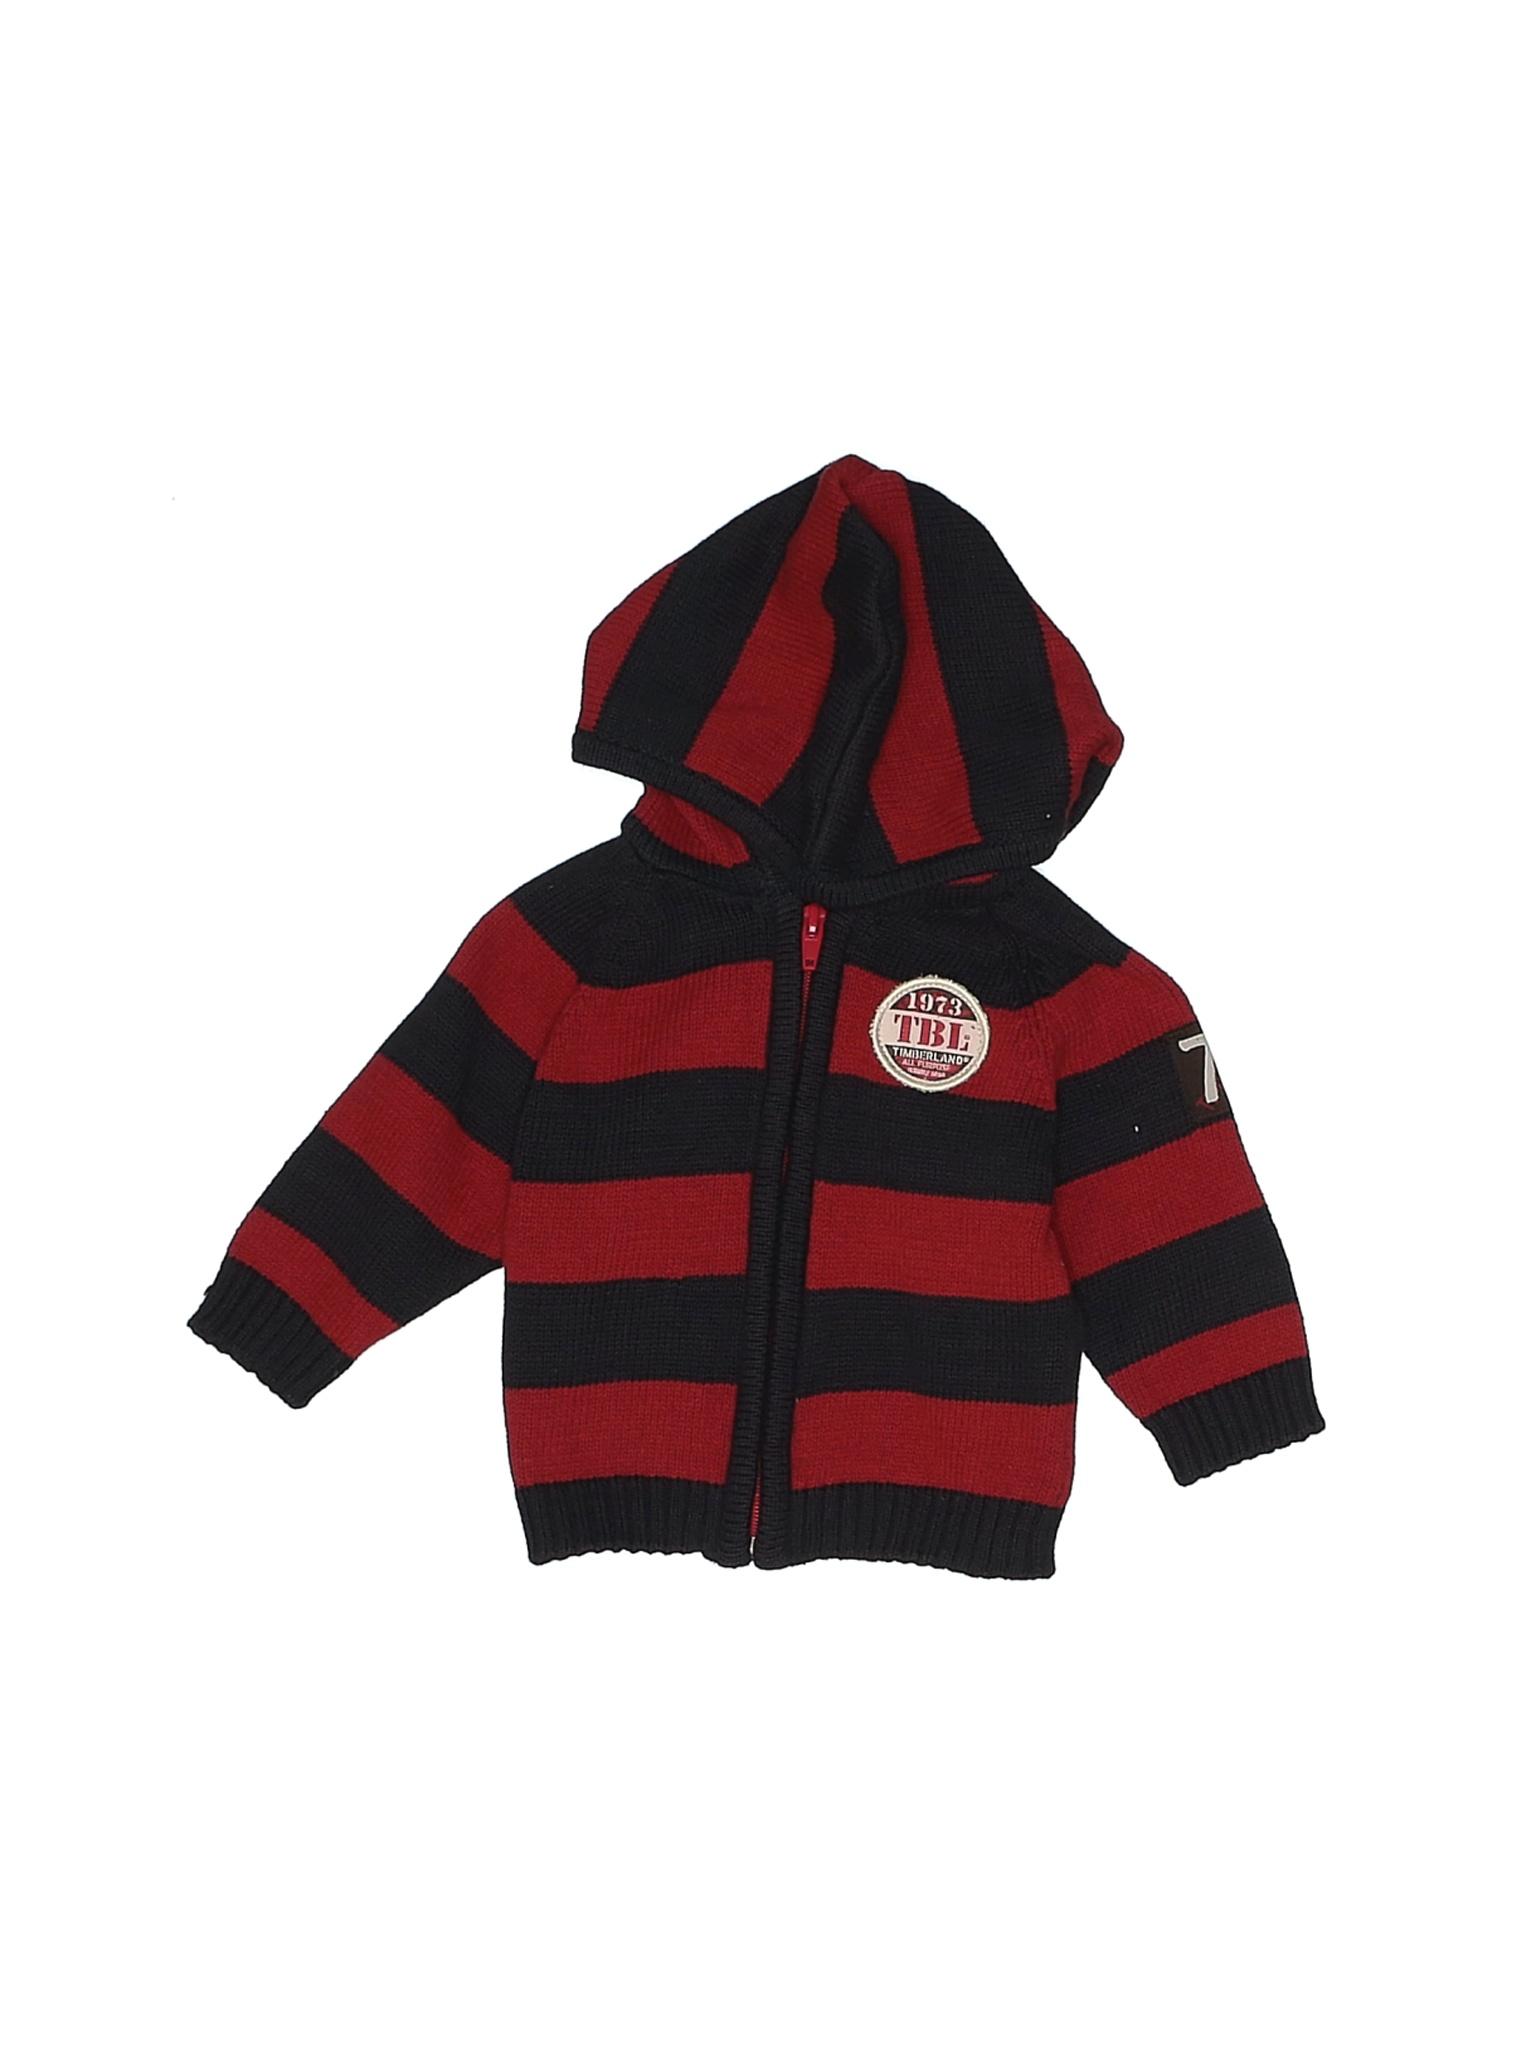 Hurley Boys Black Icon Fleece Zip Up Hoodie NEW 12 18 24 monthsTags $40